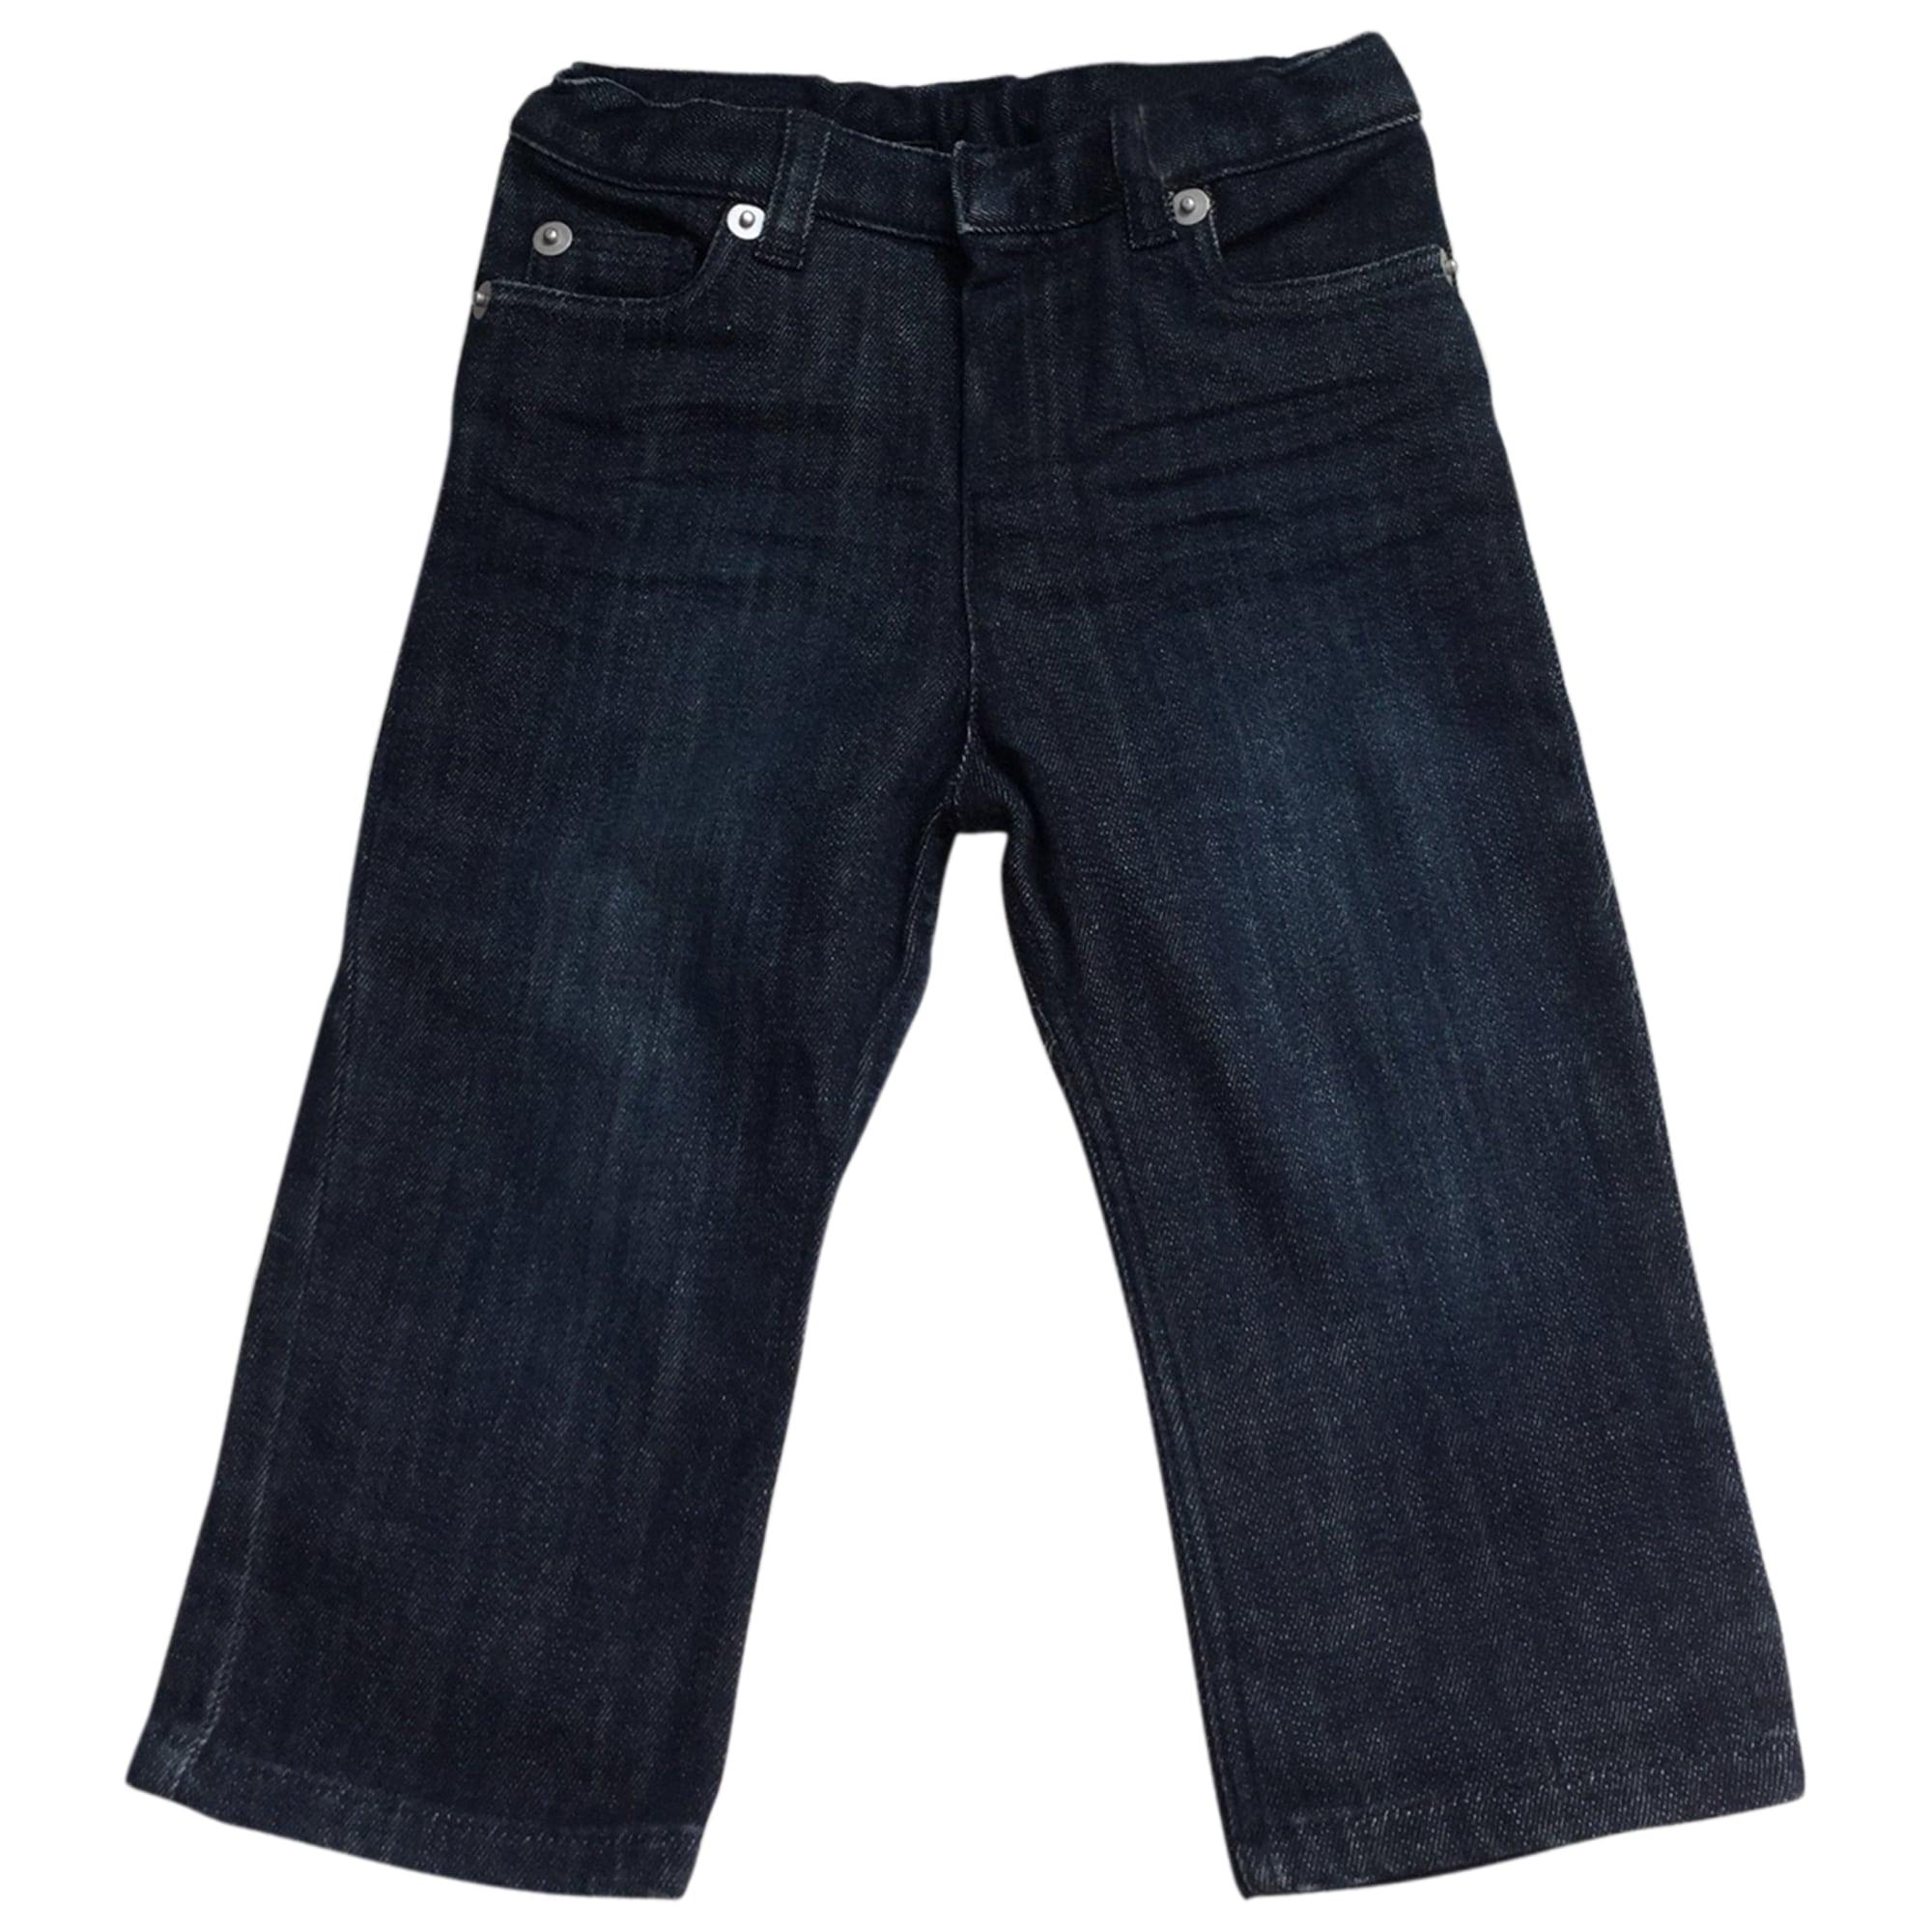 Pantalone BABY DIOR Blu, blu navy, turchese